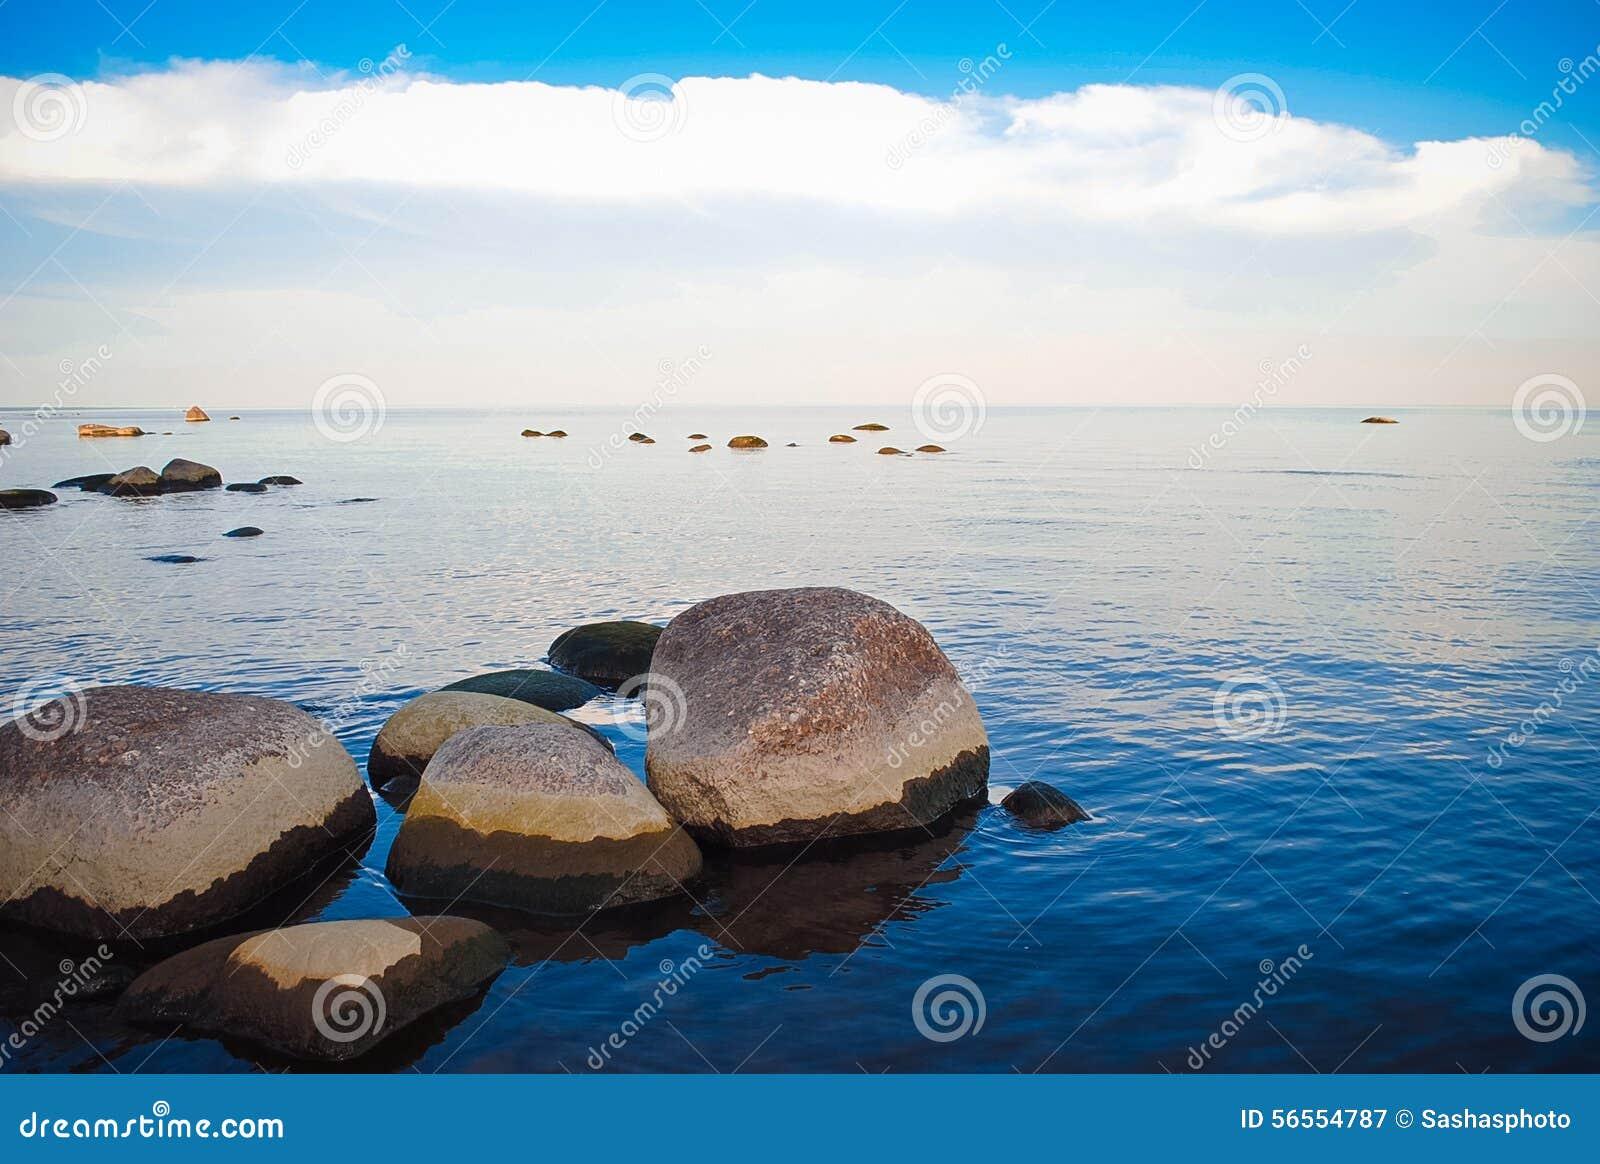 Download Η δύσκολη ακτή και τα ήρεμα νερά της θάλασσας Στοκ Εικόνα - εικόνα από βράχος, σκηνή: 56554787